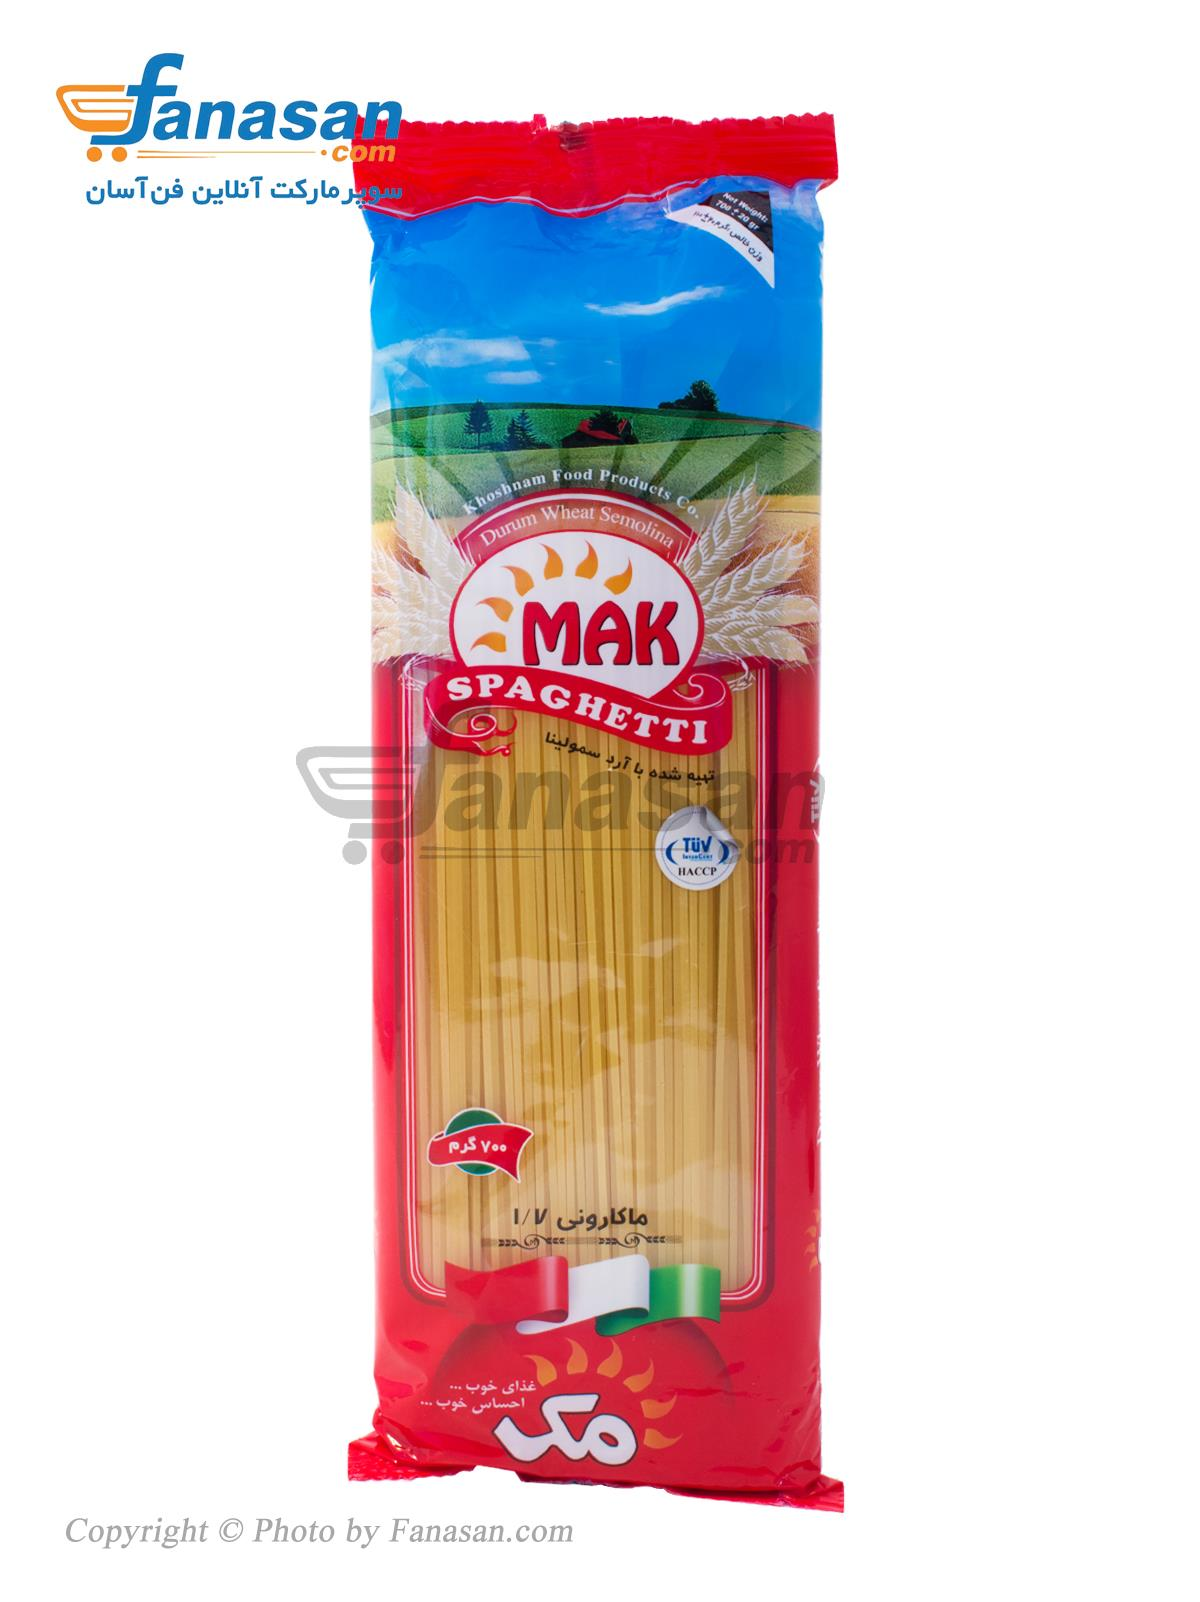 اسپاگتی مک 1/7 با آرد سمولینا 700 گرم